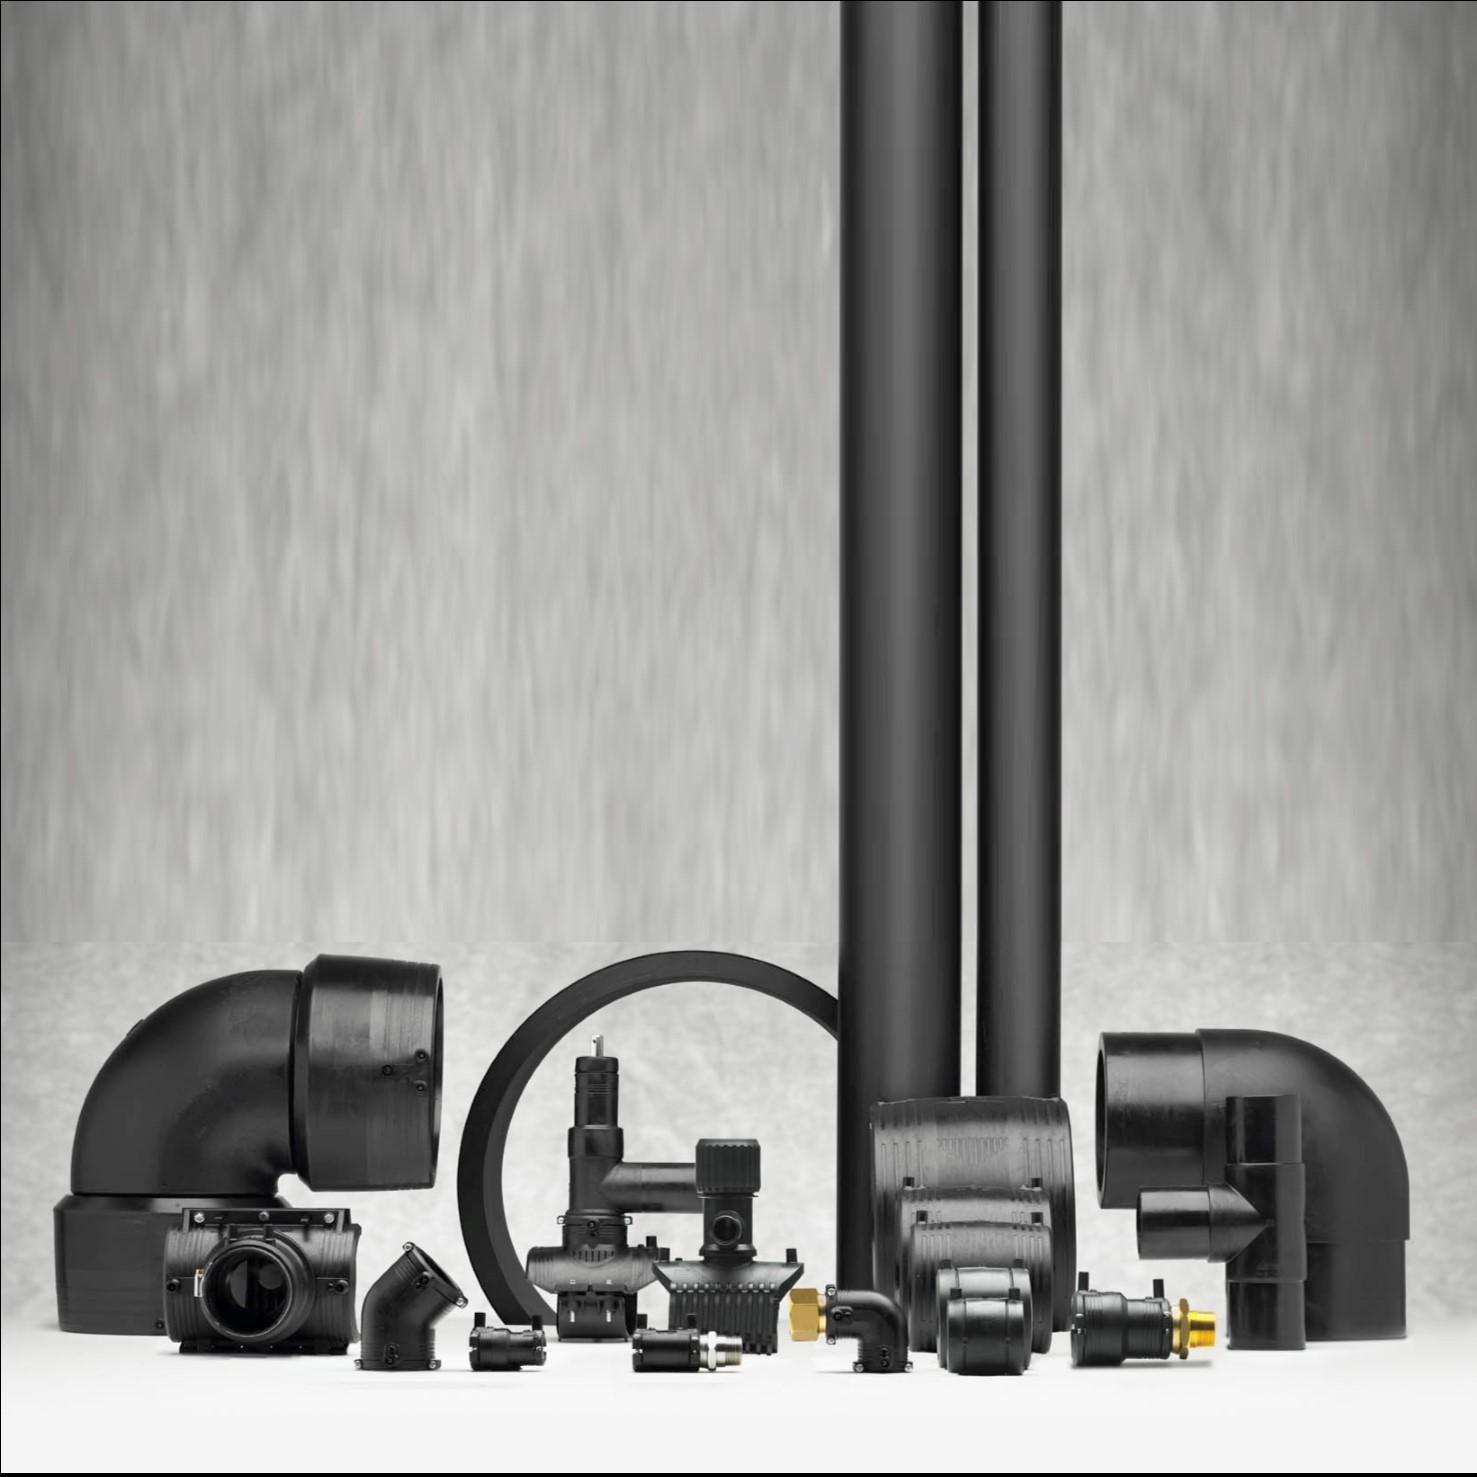 PE industriële kunststof leidingsystemen